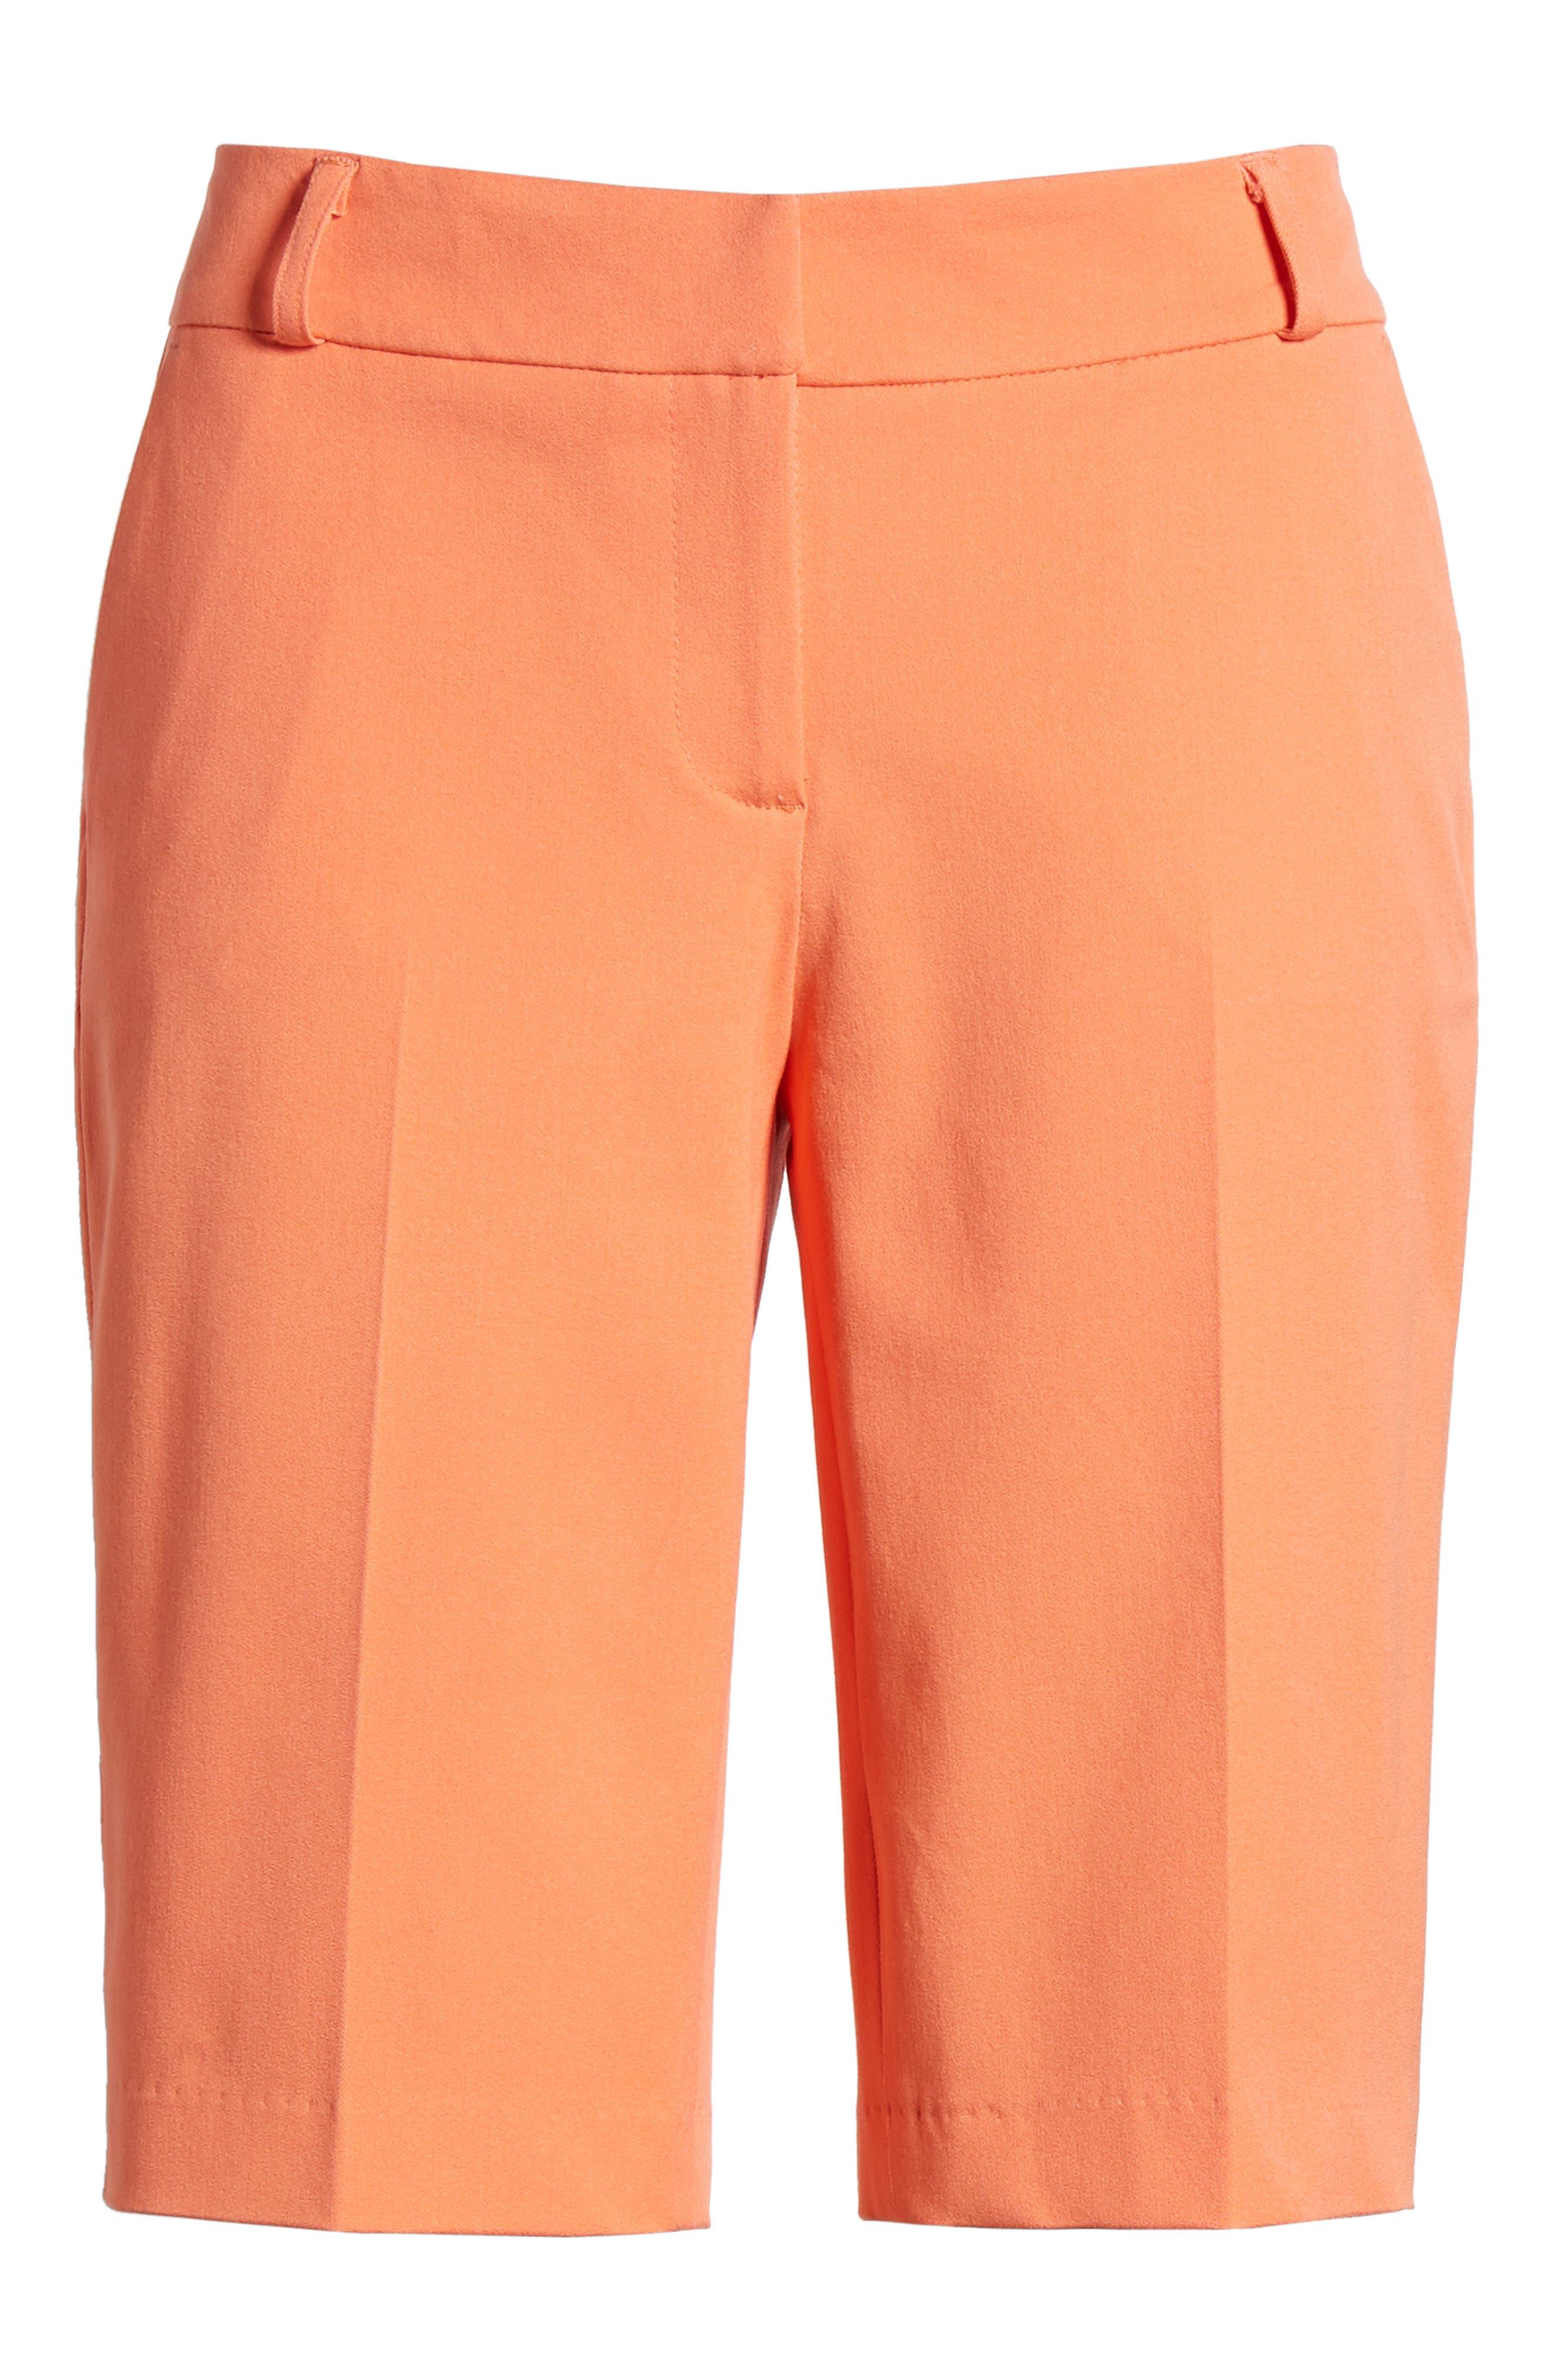 Stretch Bermuda Shorts,                             Alternate thumbnail 49, color,